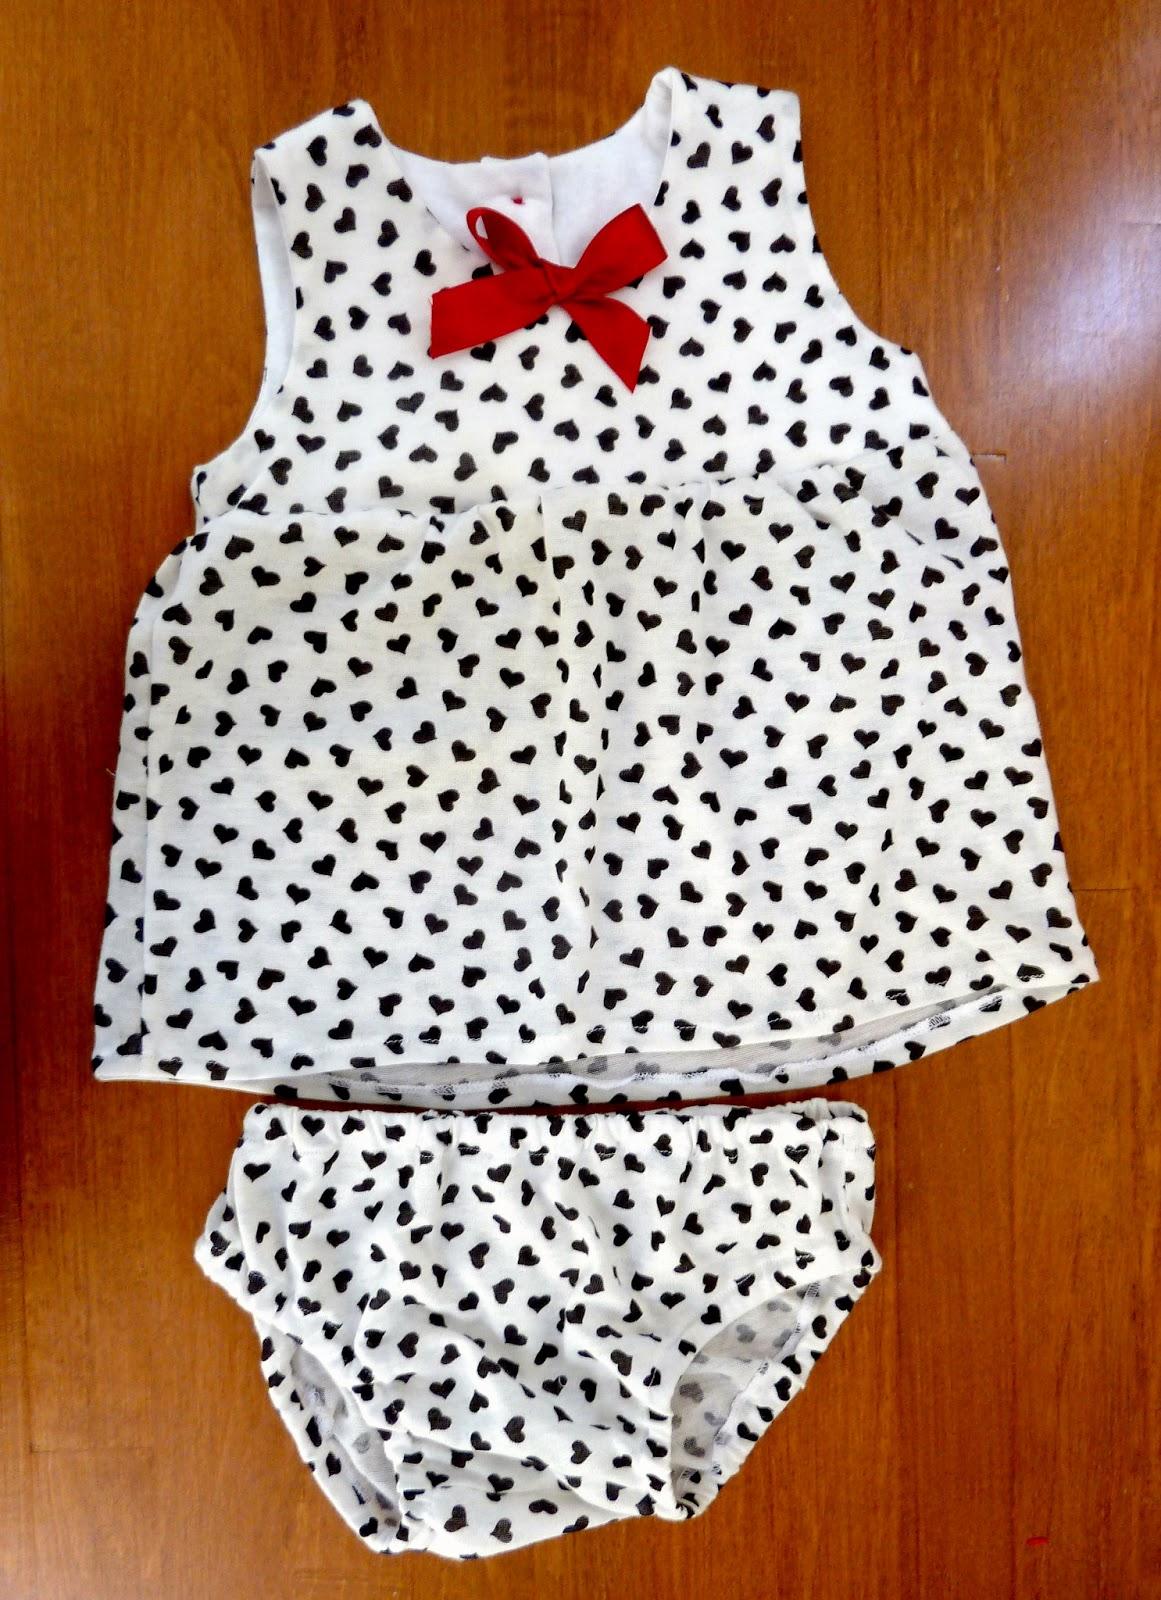 Baby Dress Sewn